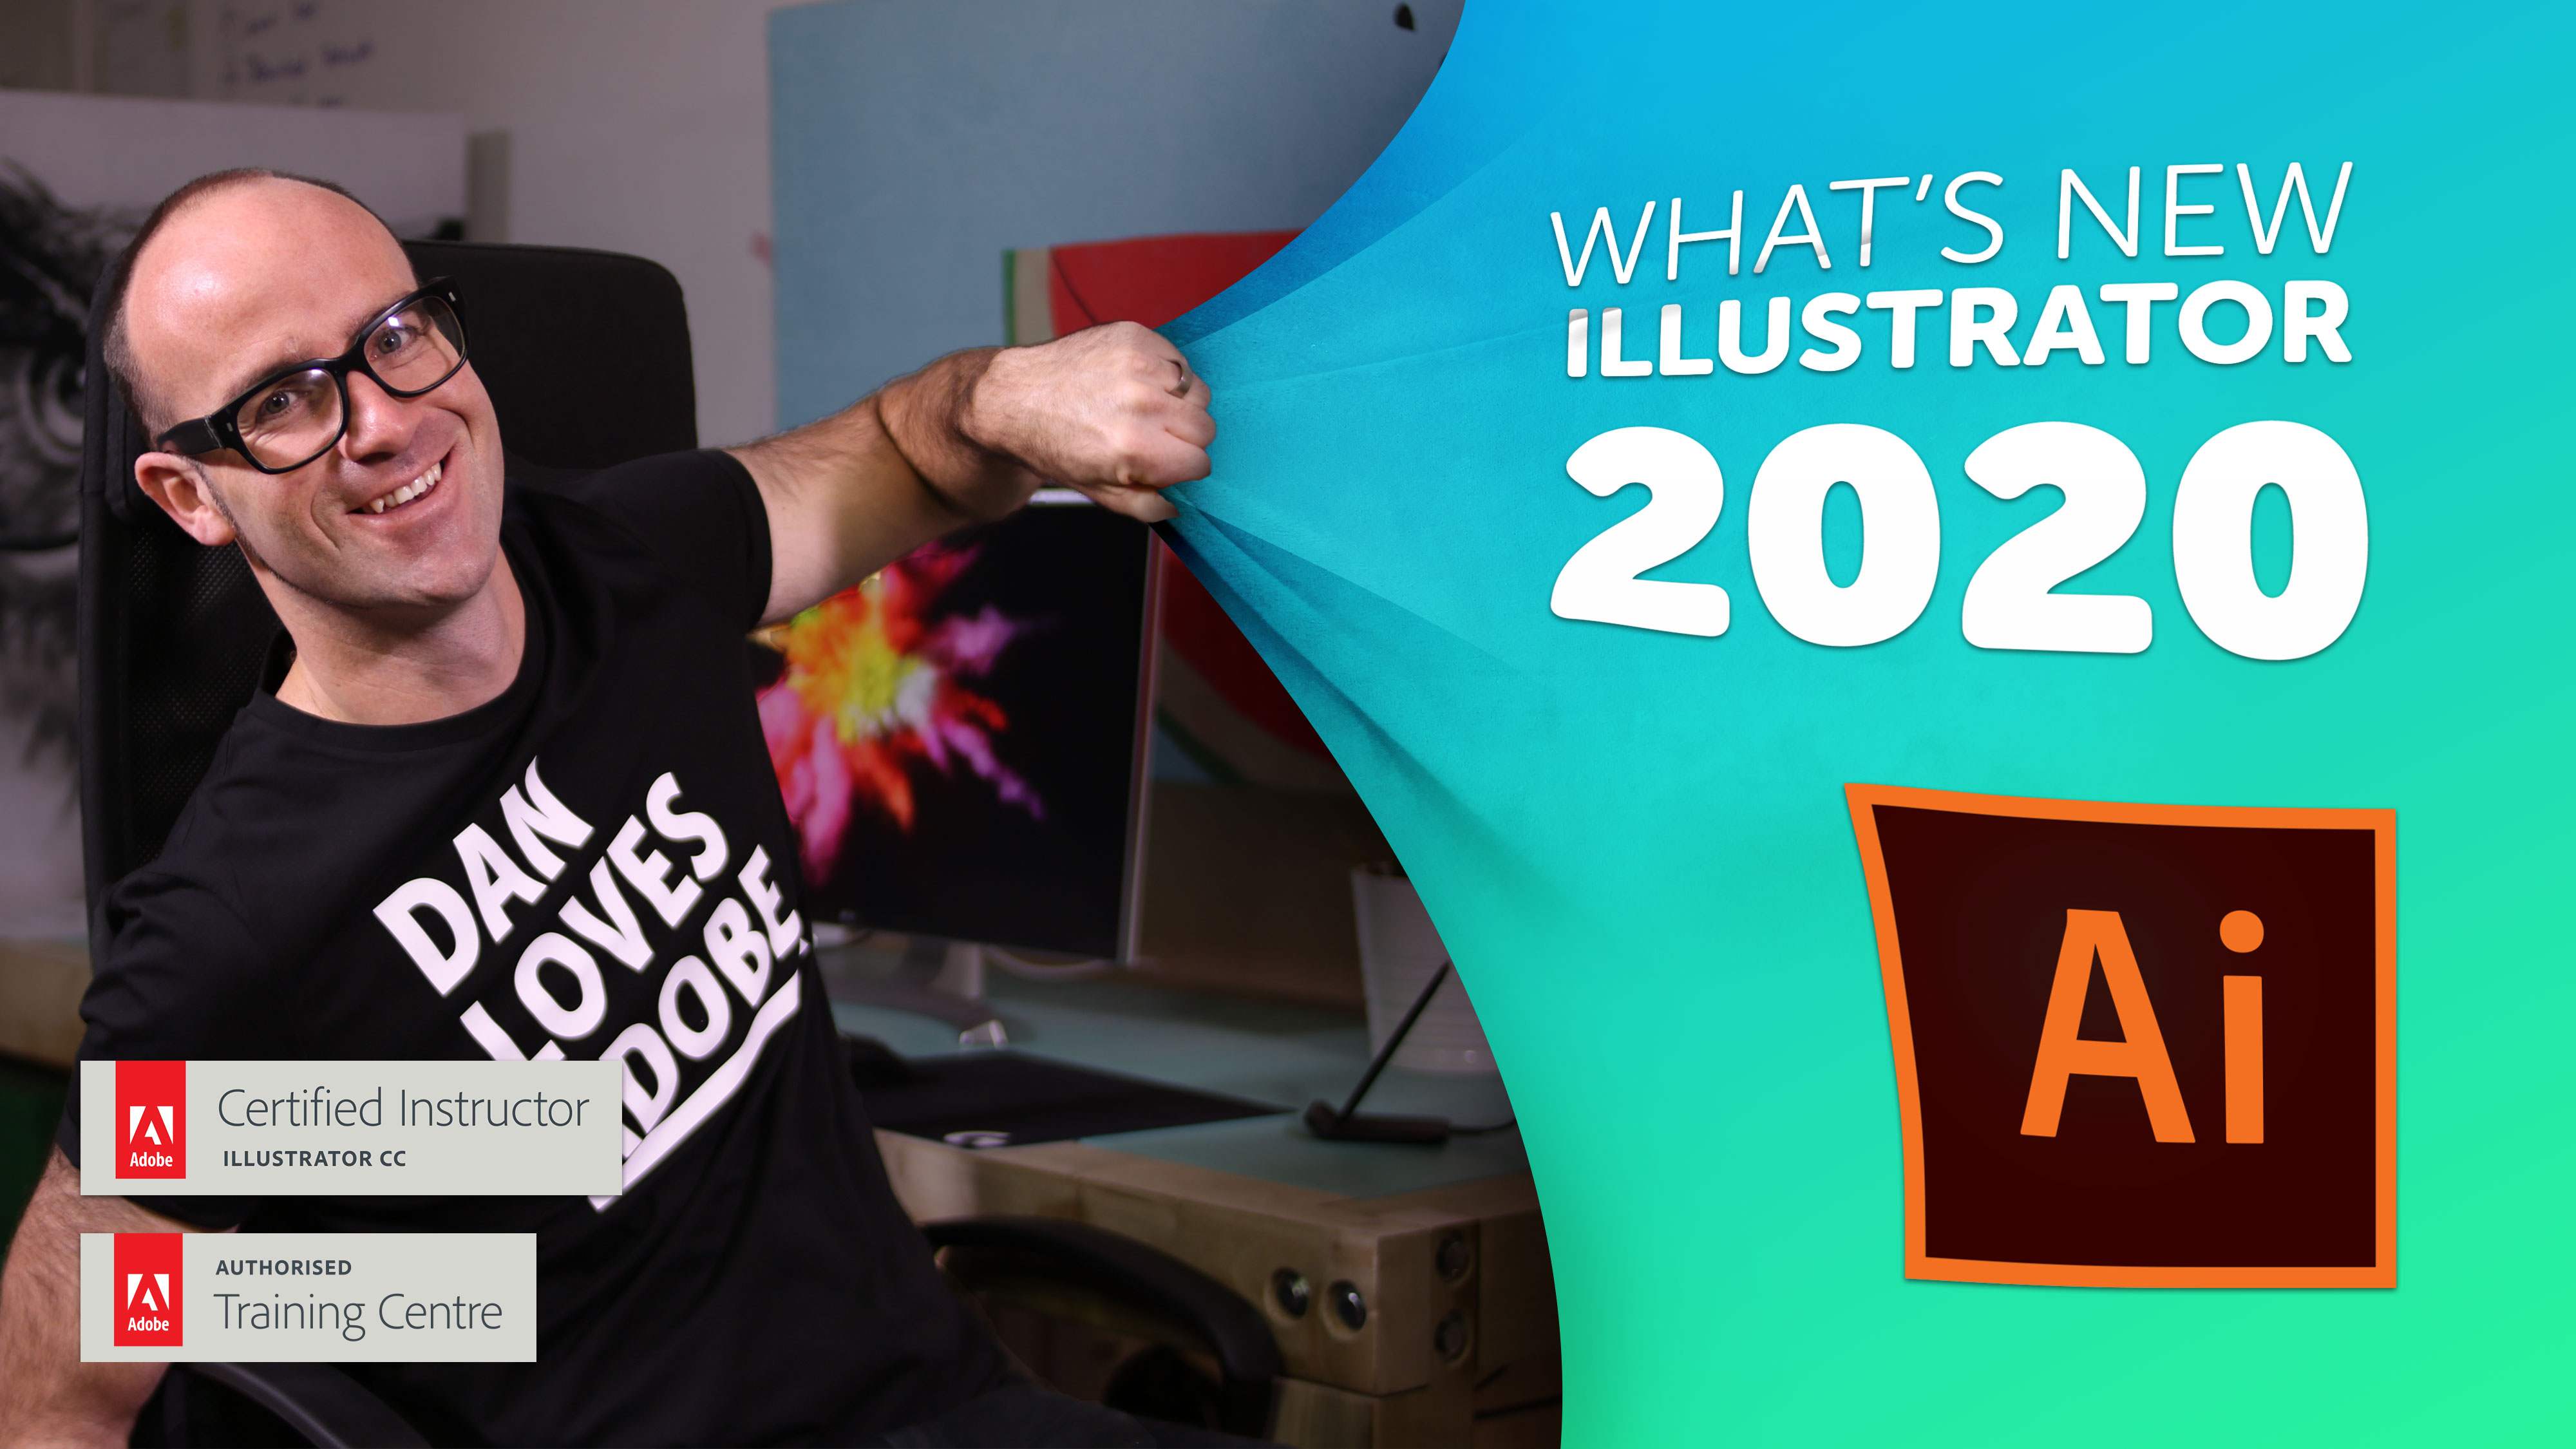 Illustrator Course Updates New Features 2020